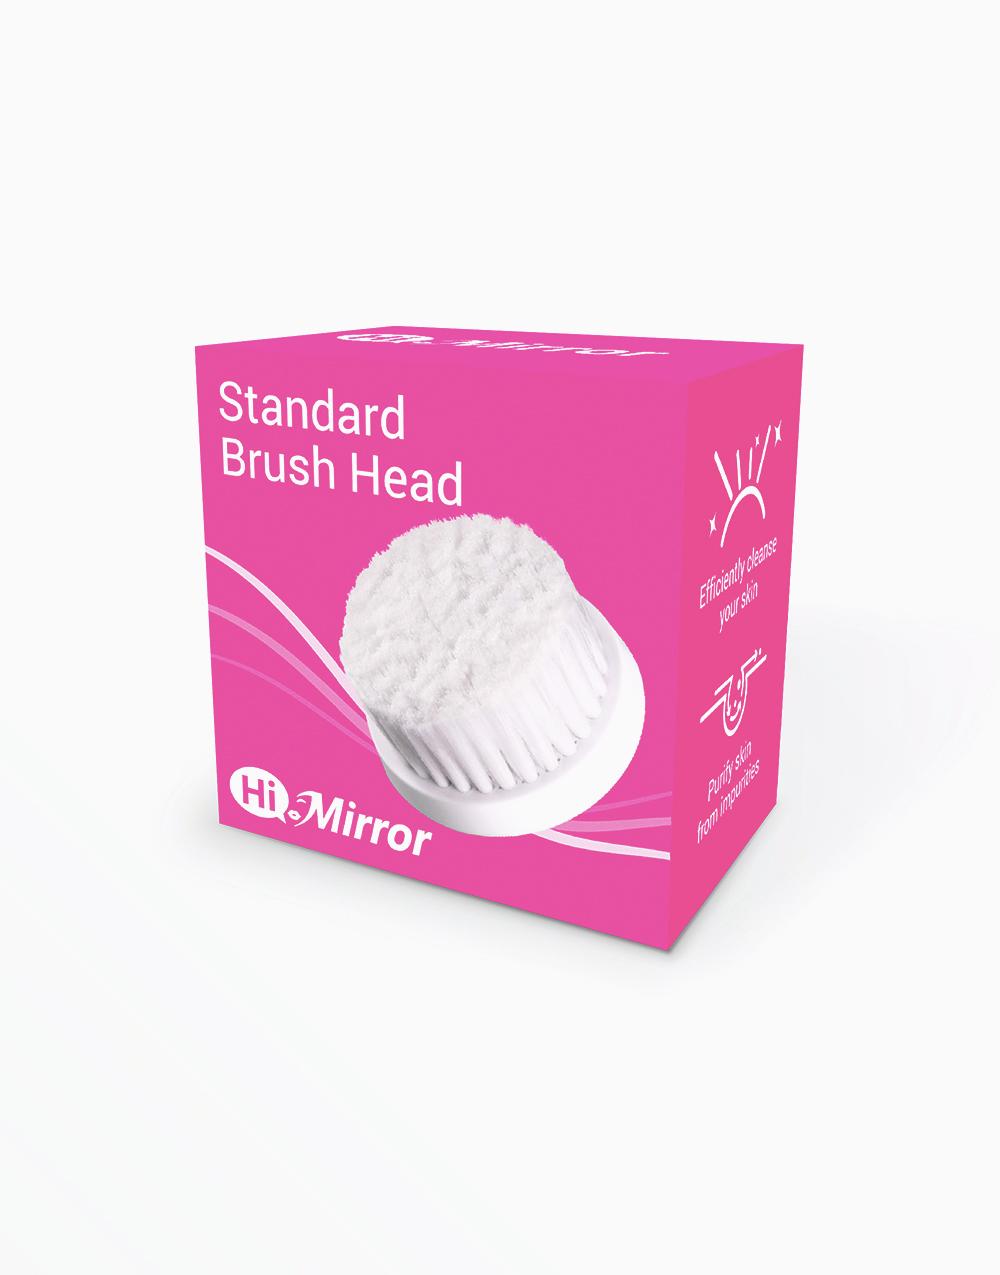 Standard Brush Head by HiMirror